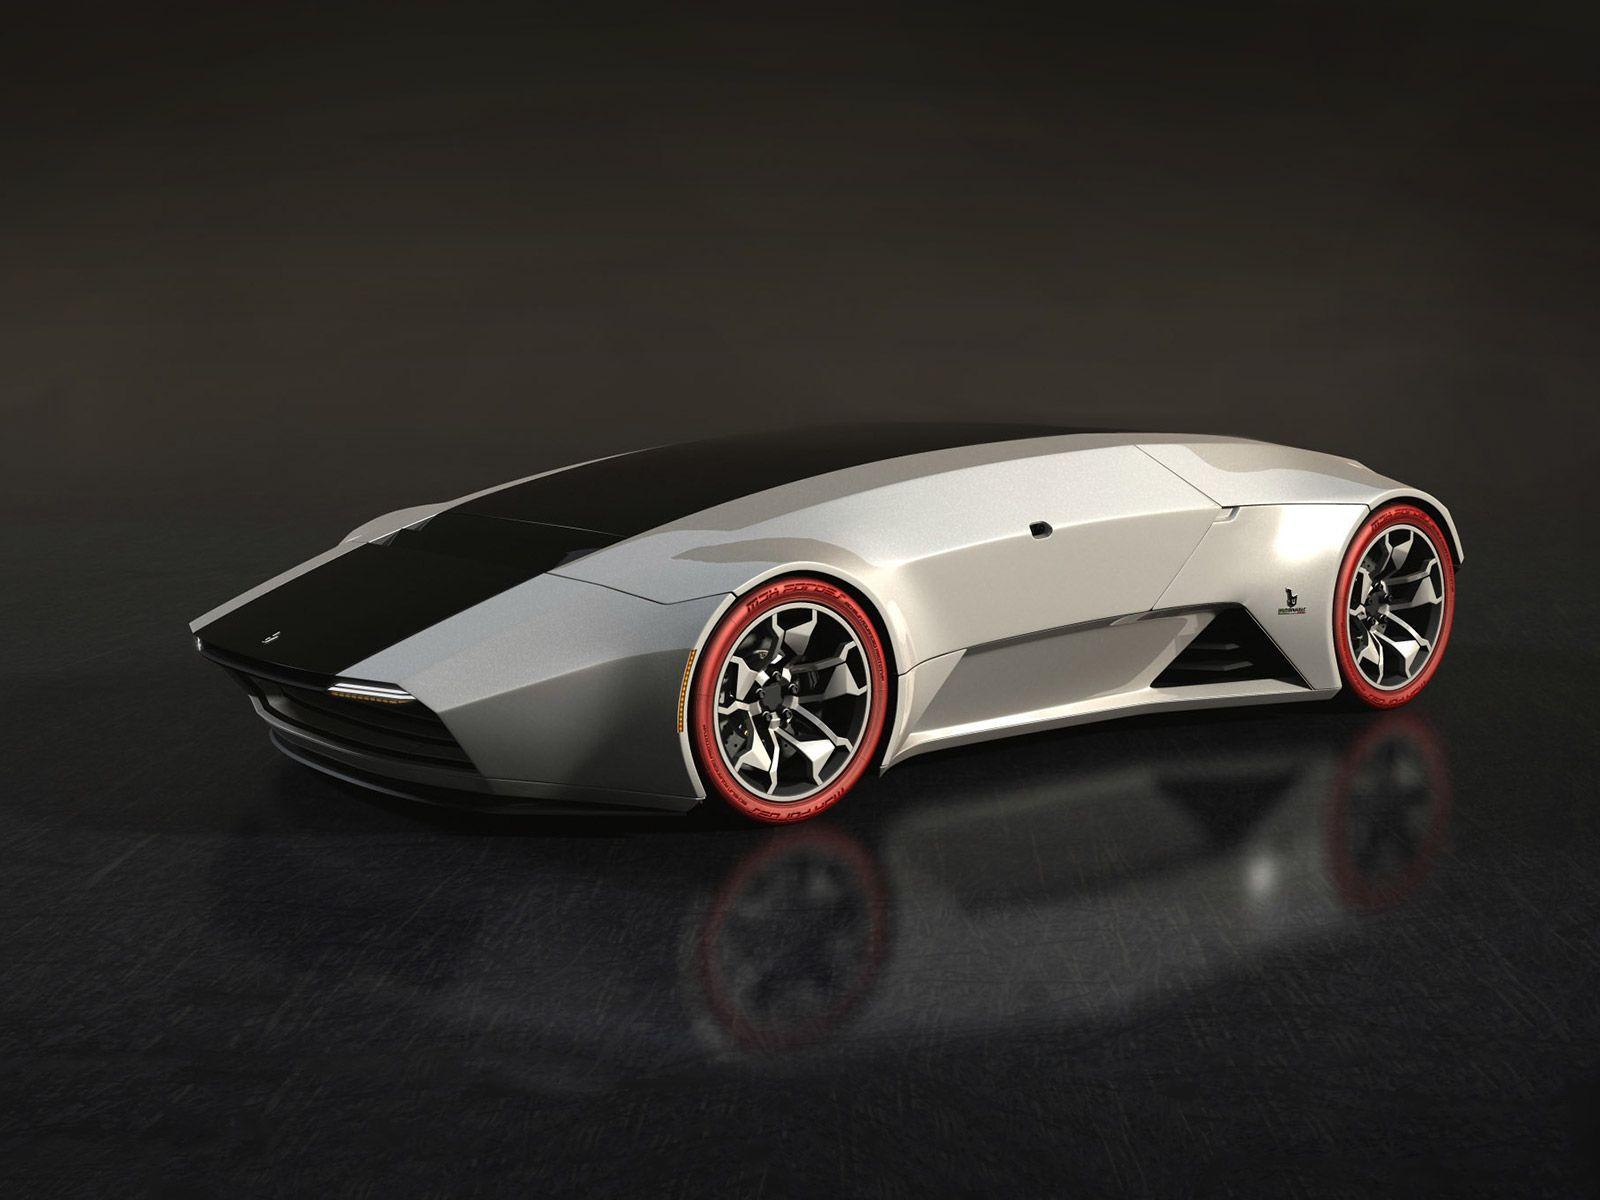 Raymanta Concept Car Body Design Concept Cars Futuristic Cars Concept Futuristic Cars